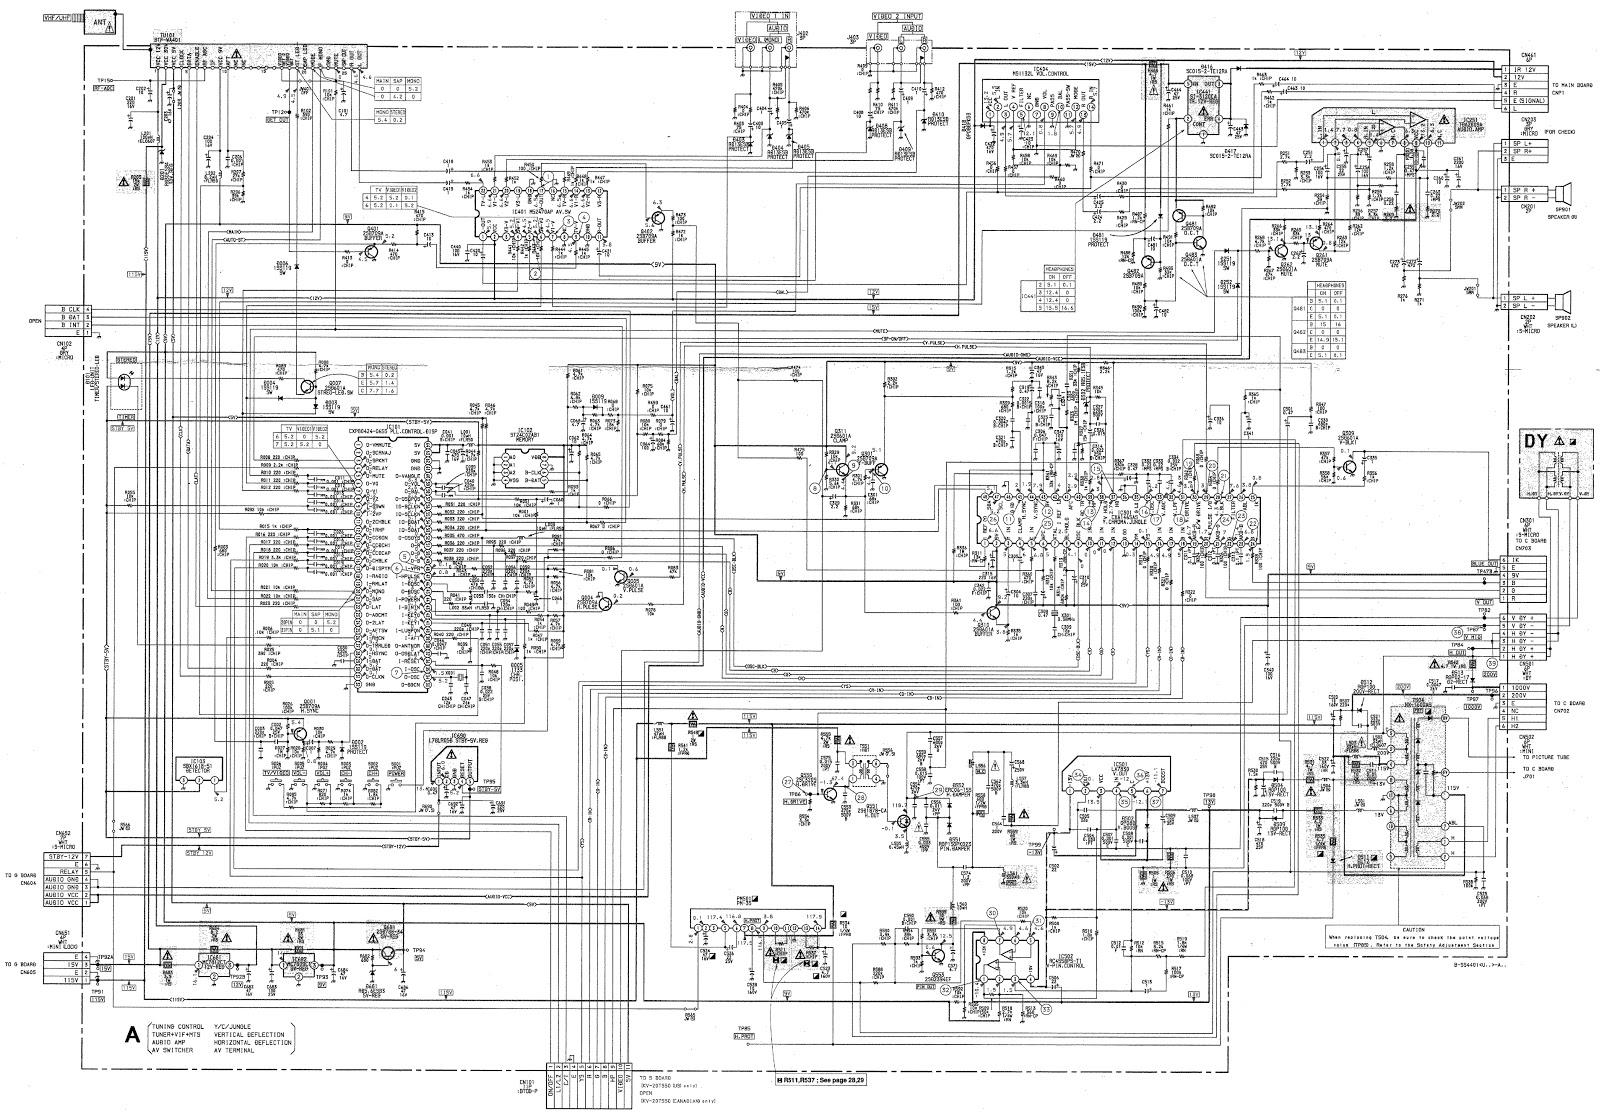 medium resolution of sony tv circuit diagram moreover tv schematic circuit diagram also sony tv circuit diagram moreover tv